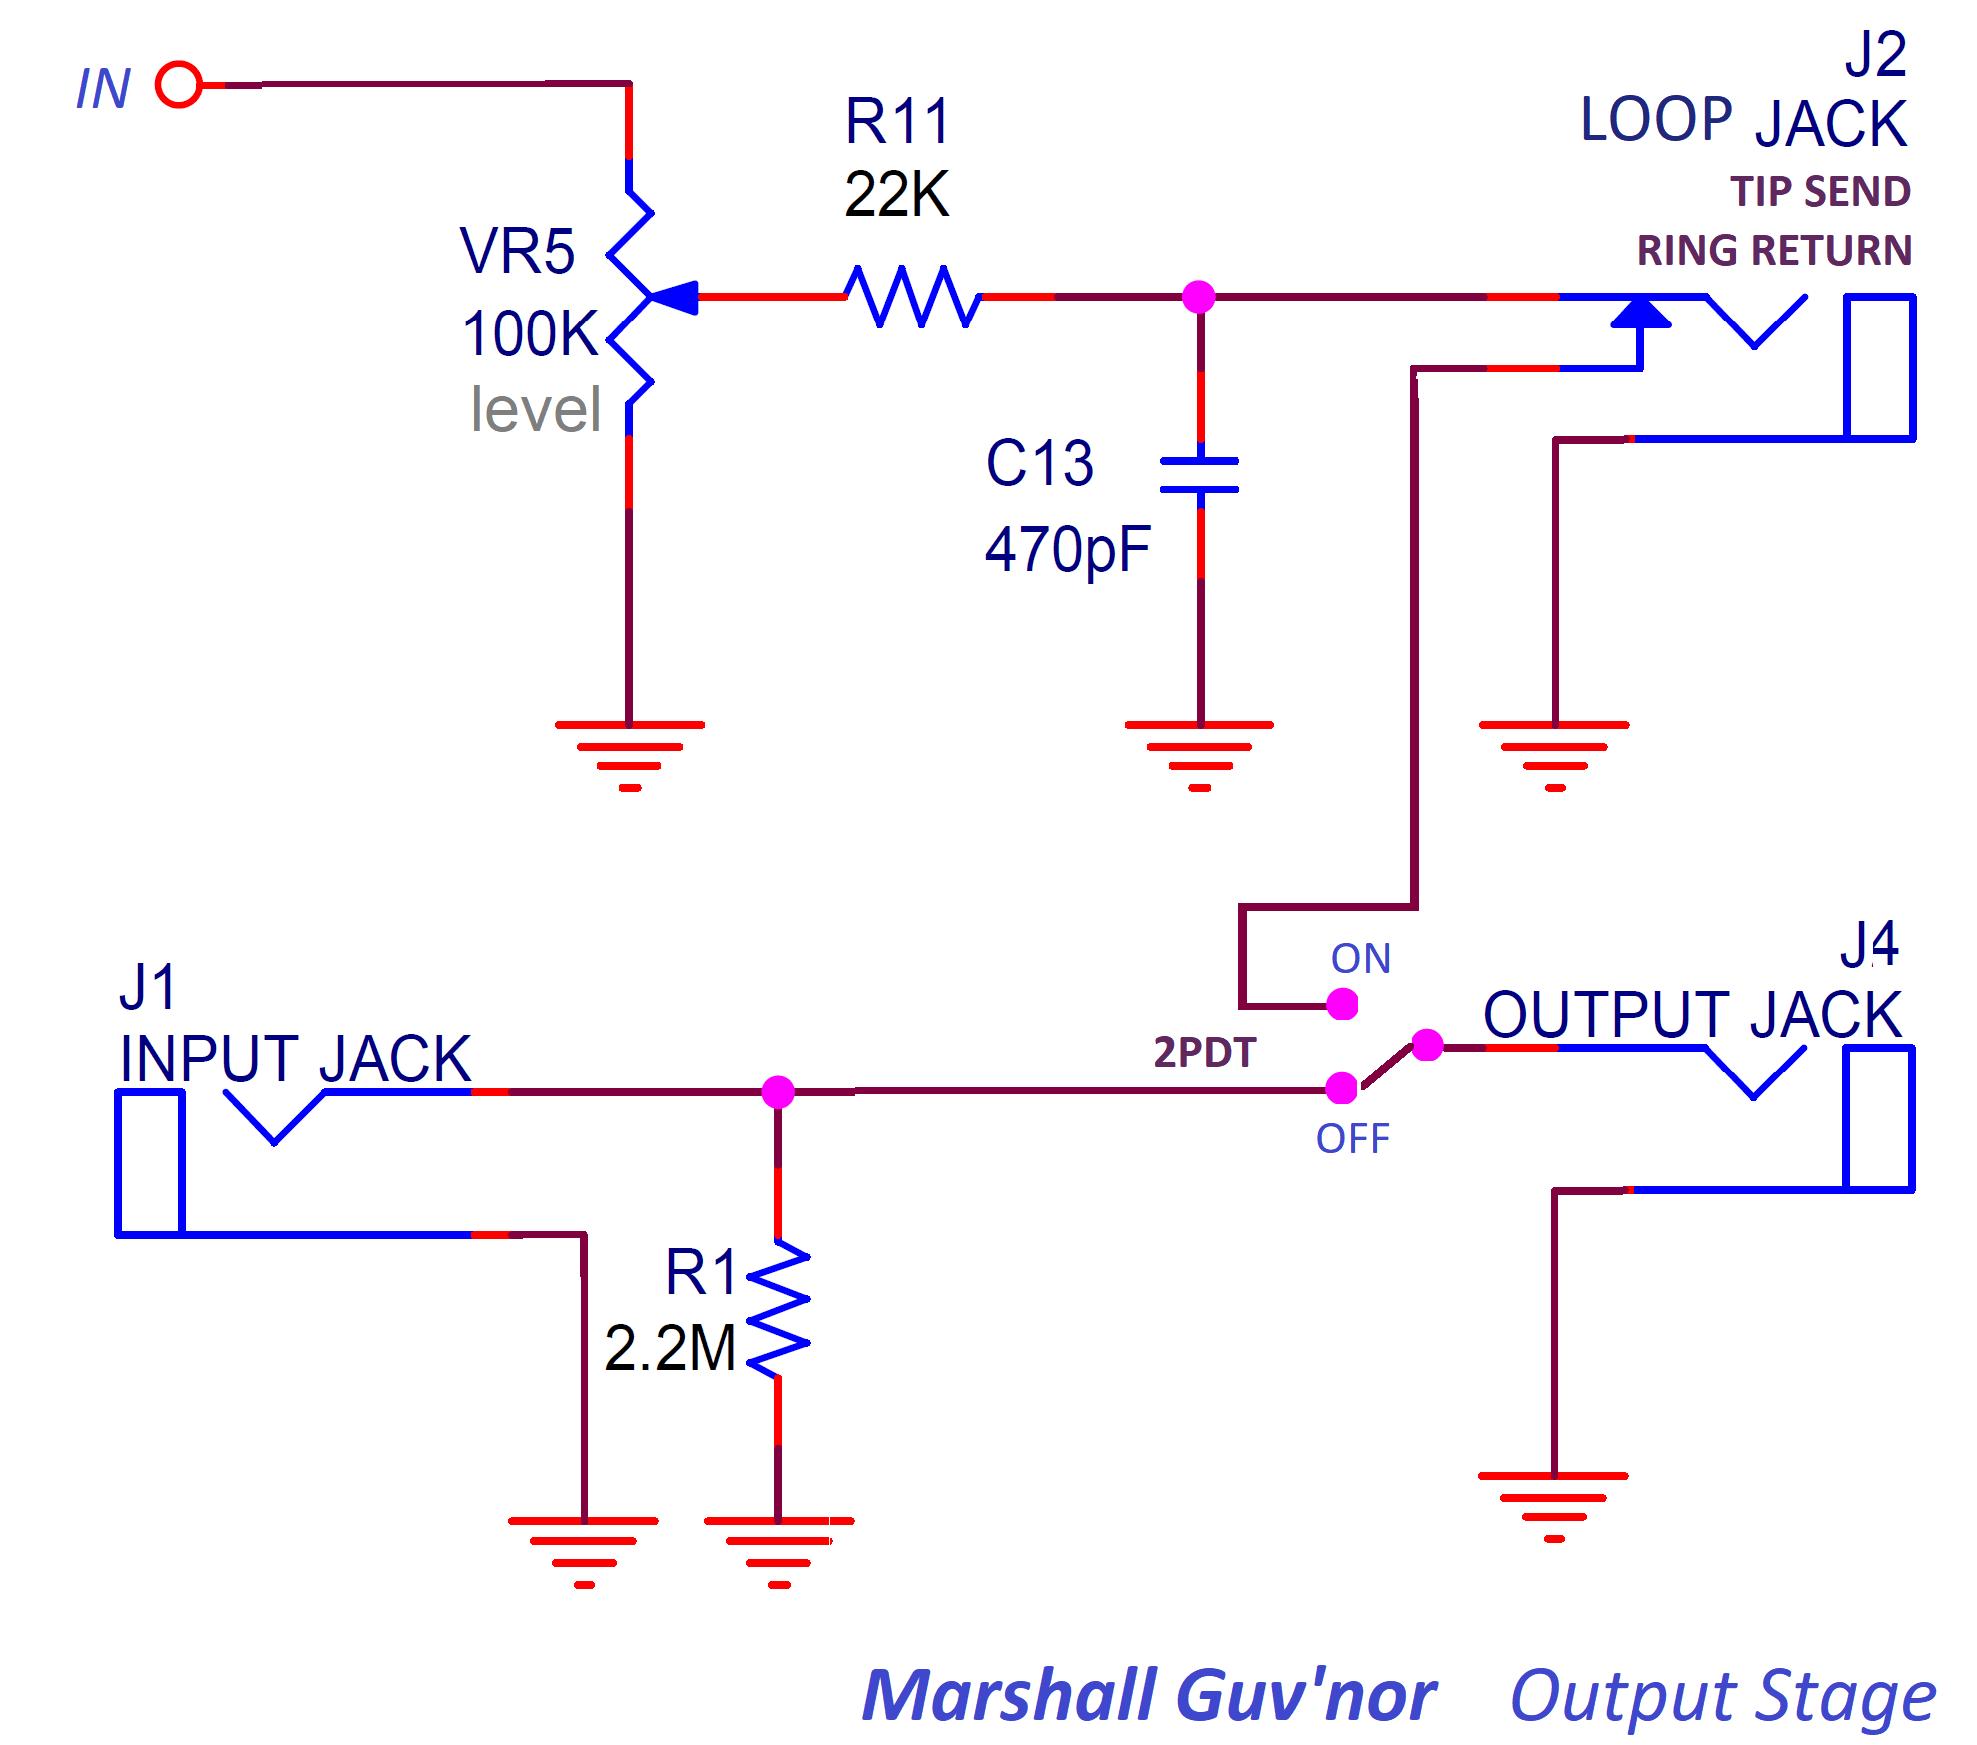 hight resolution of marshall guvnor output stage